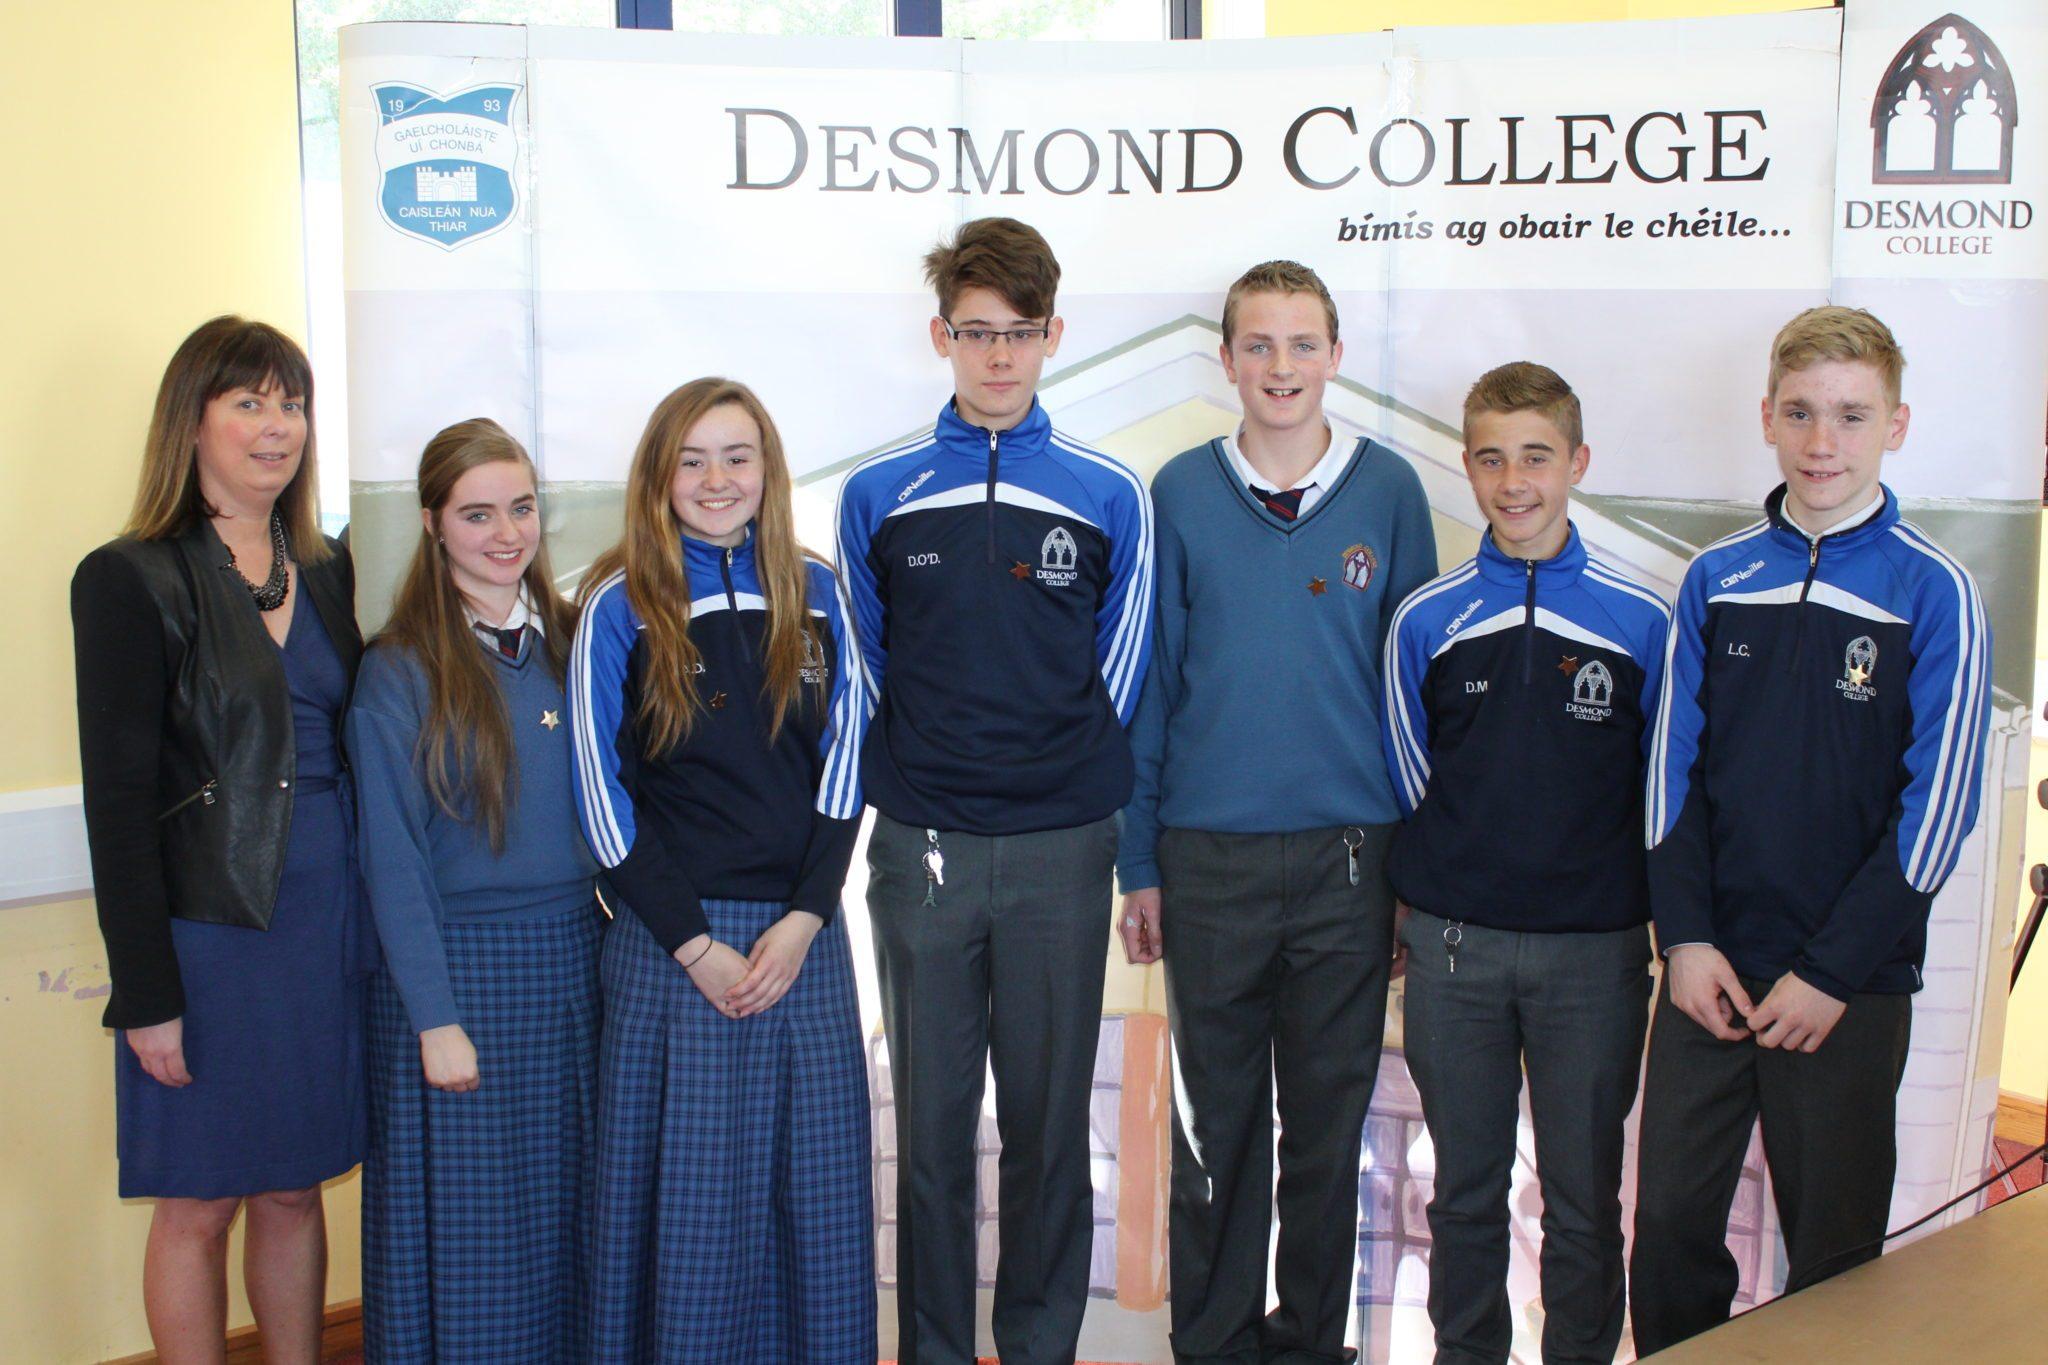 Desmond College Student Awards: May 2015: DEDICATION AND COMMITMENT AWARDS: 2nd year : Ms Cregan with Clodagh O'Keefe, Alice Duffy, David O'Donovan, Jason Ryan, Dylan Moloney, Liam Callinan